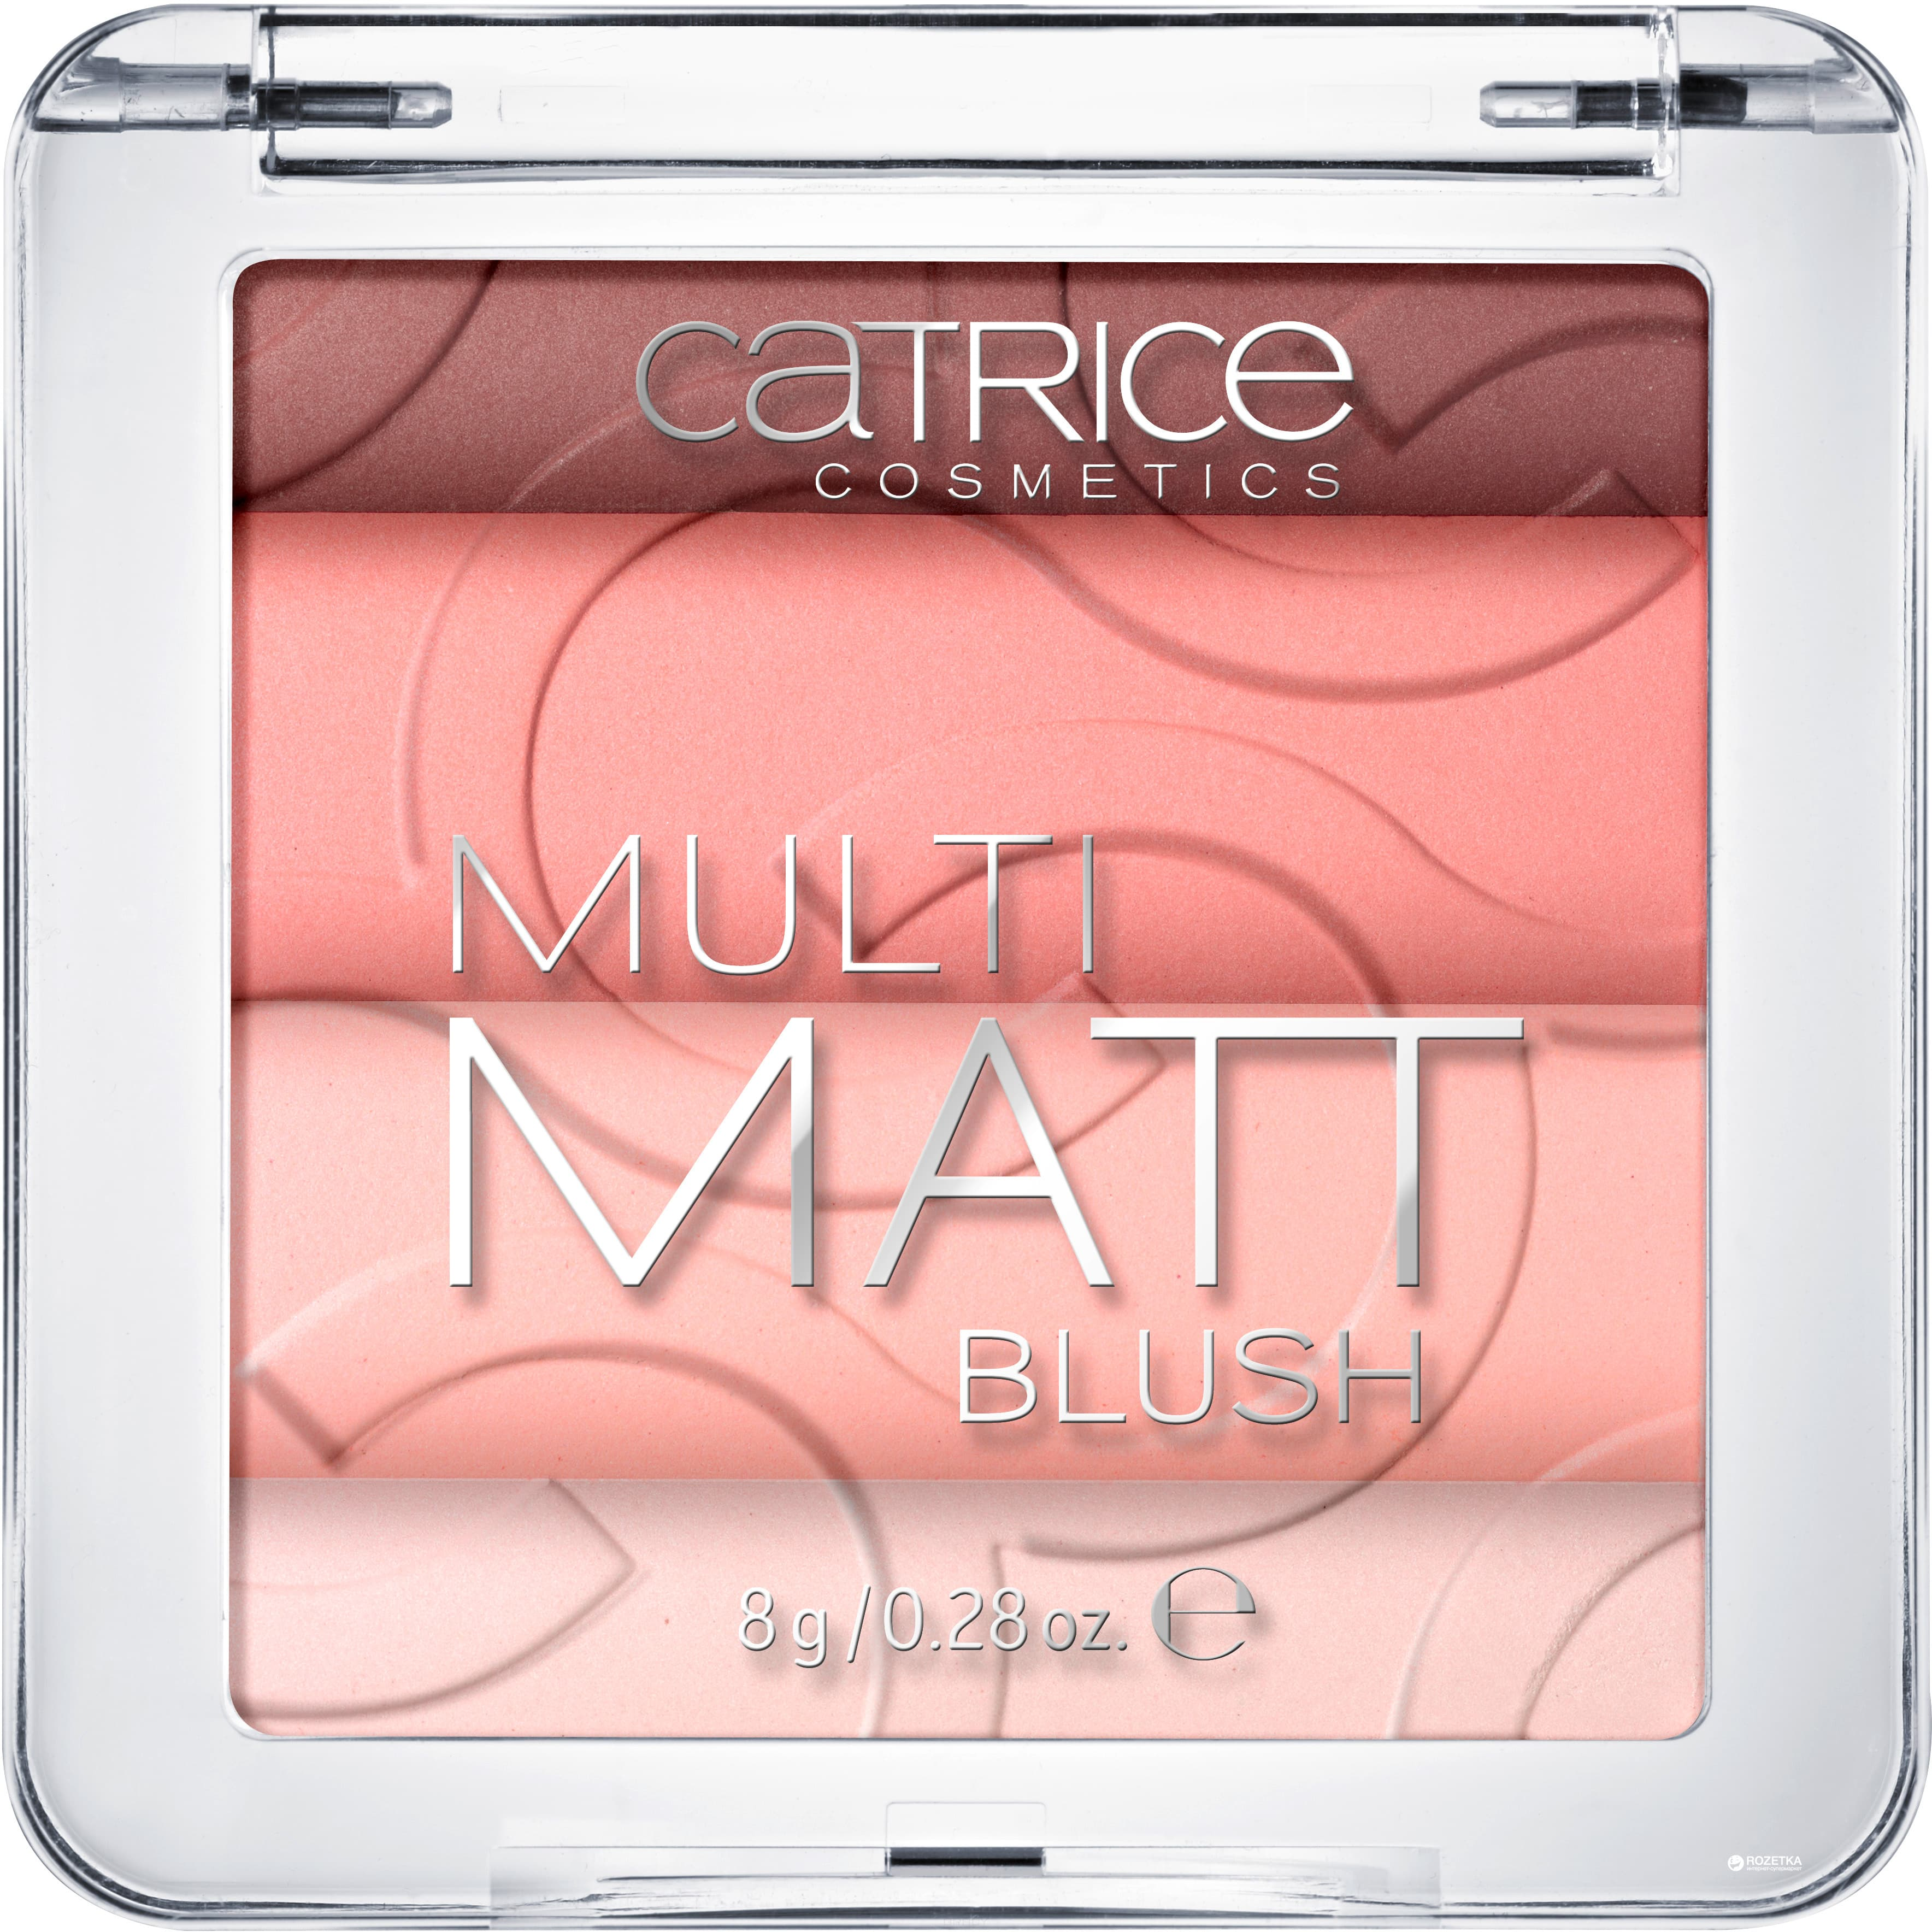 Купить Catrice, Румяна Multi Matt Blush, 8 гр (2 оттенка)